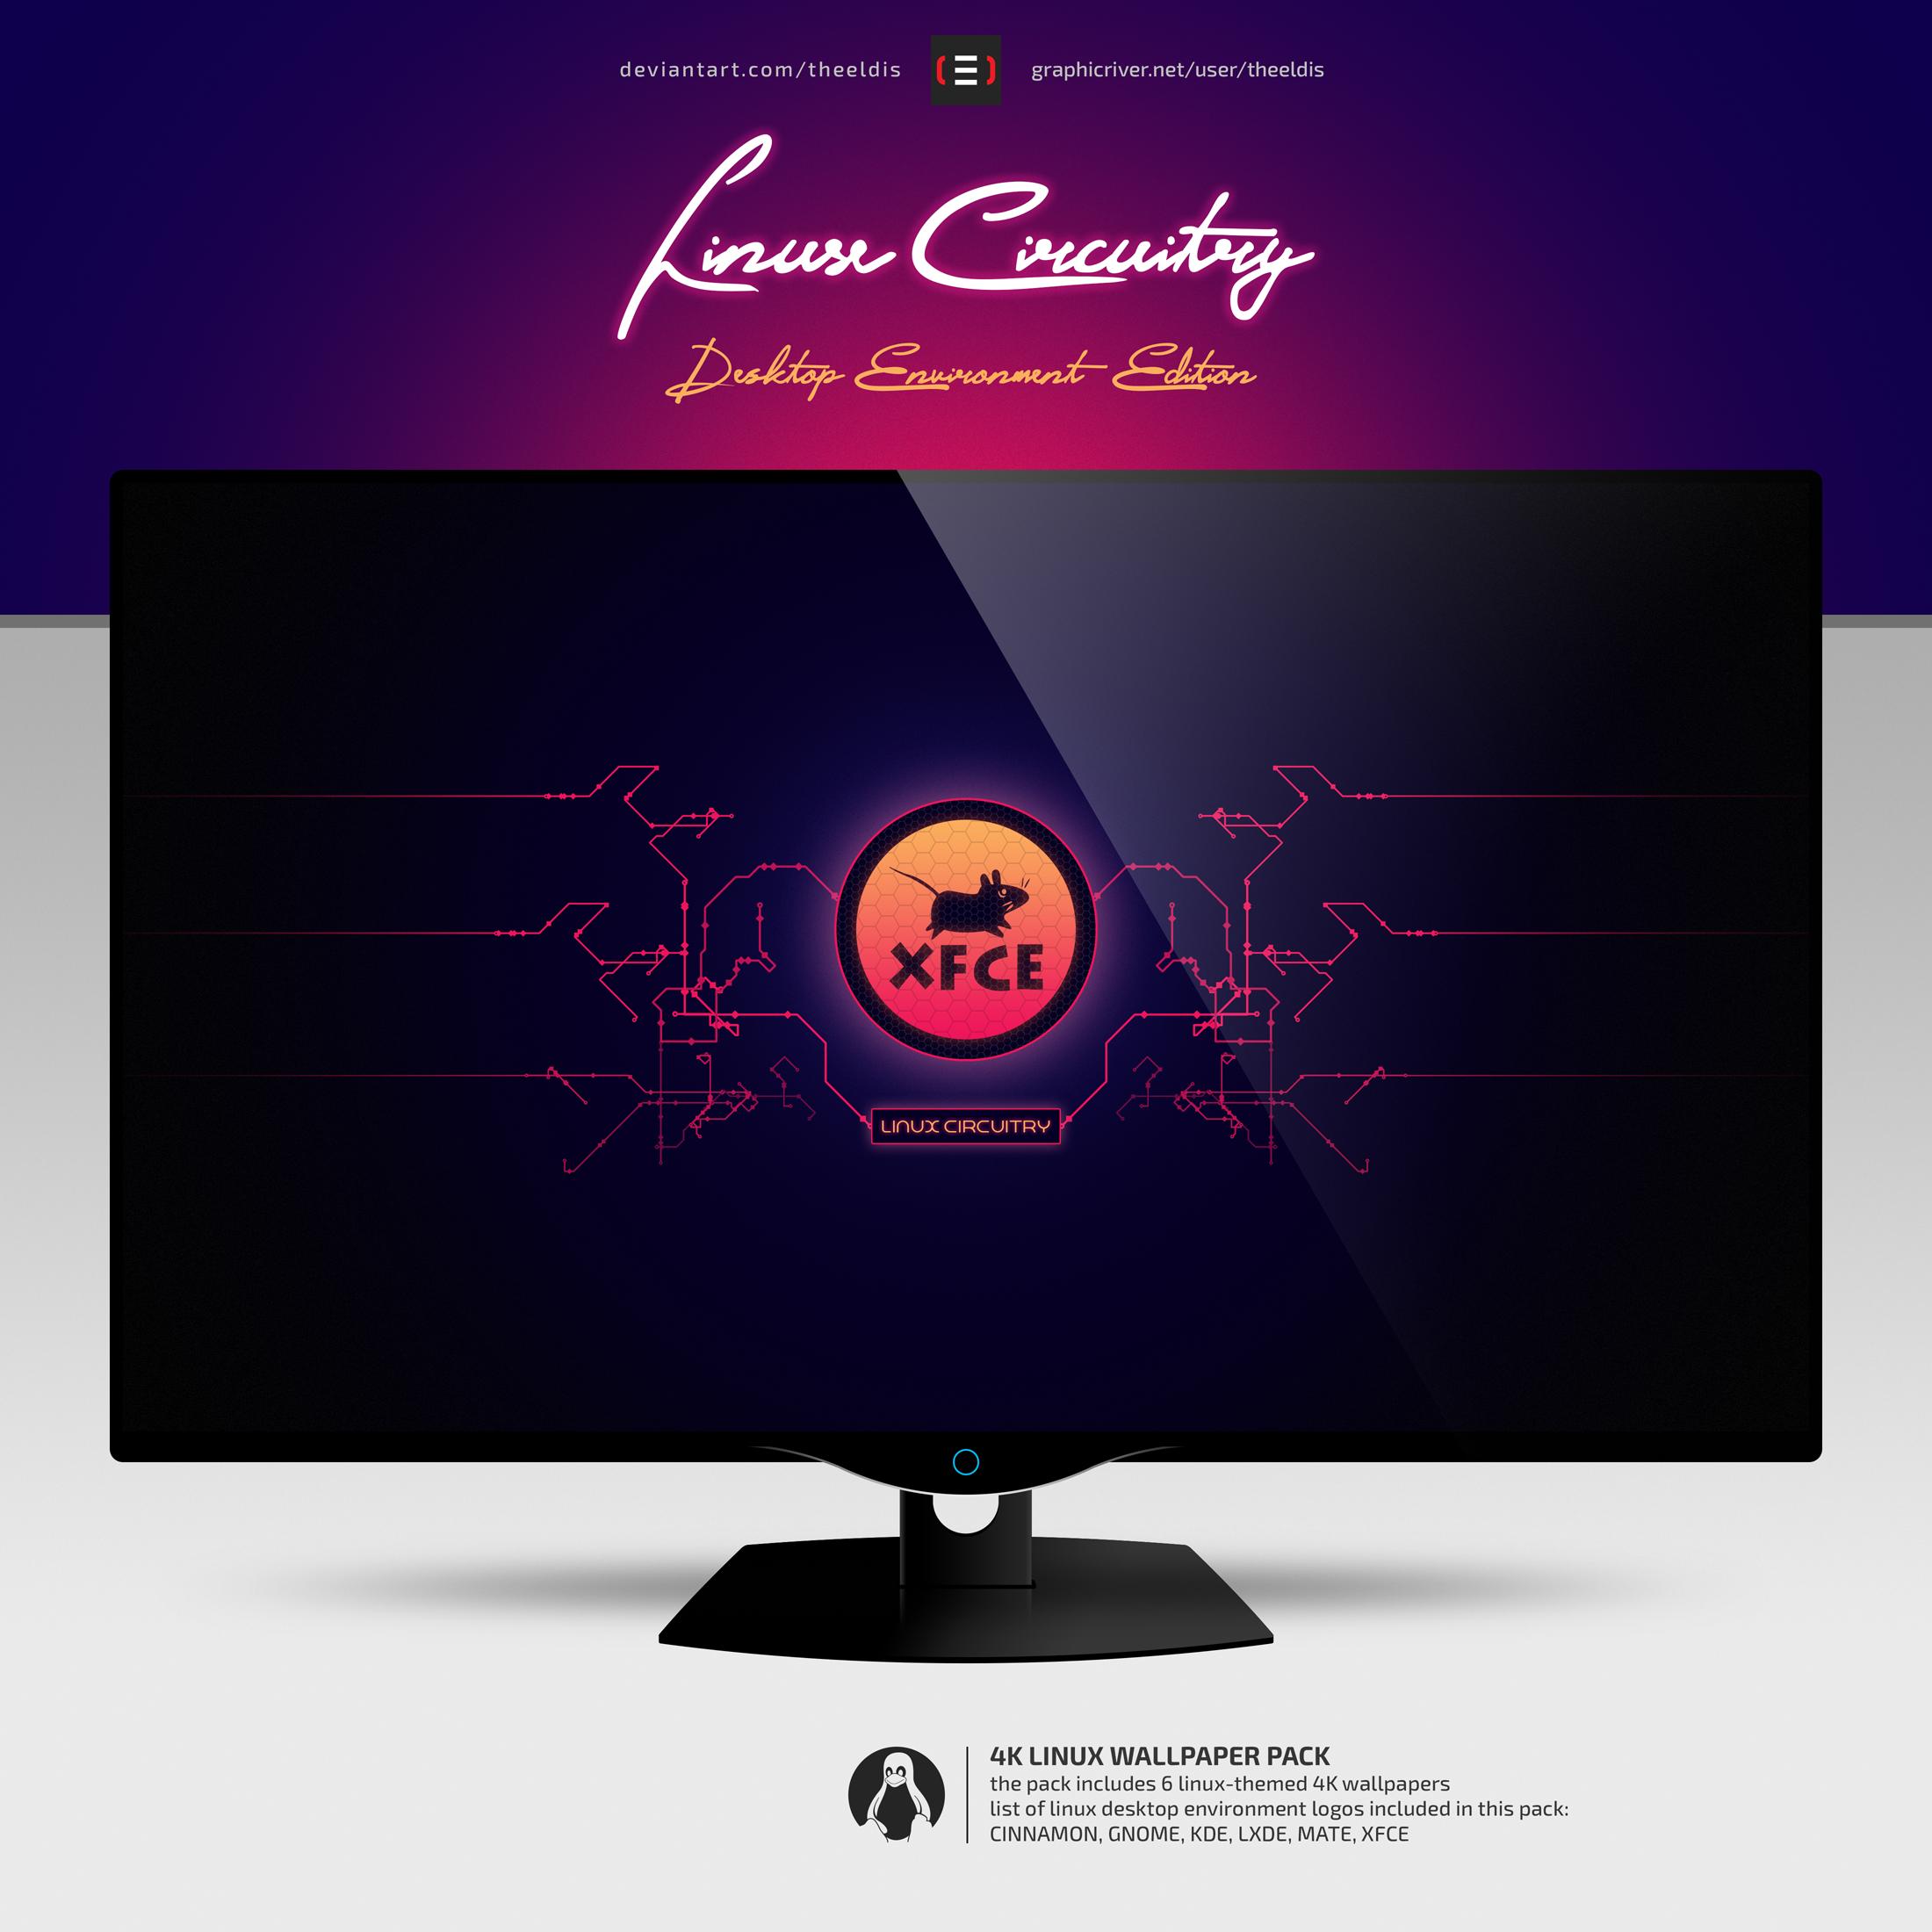 Linux Circuitry 4K DE